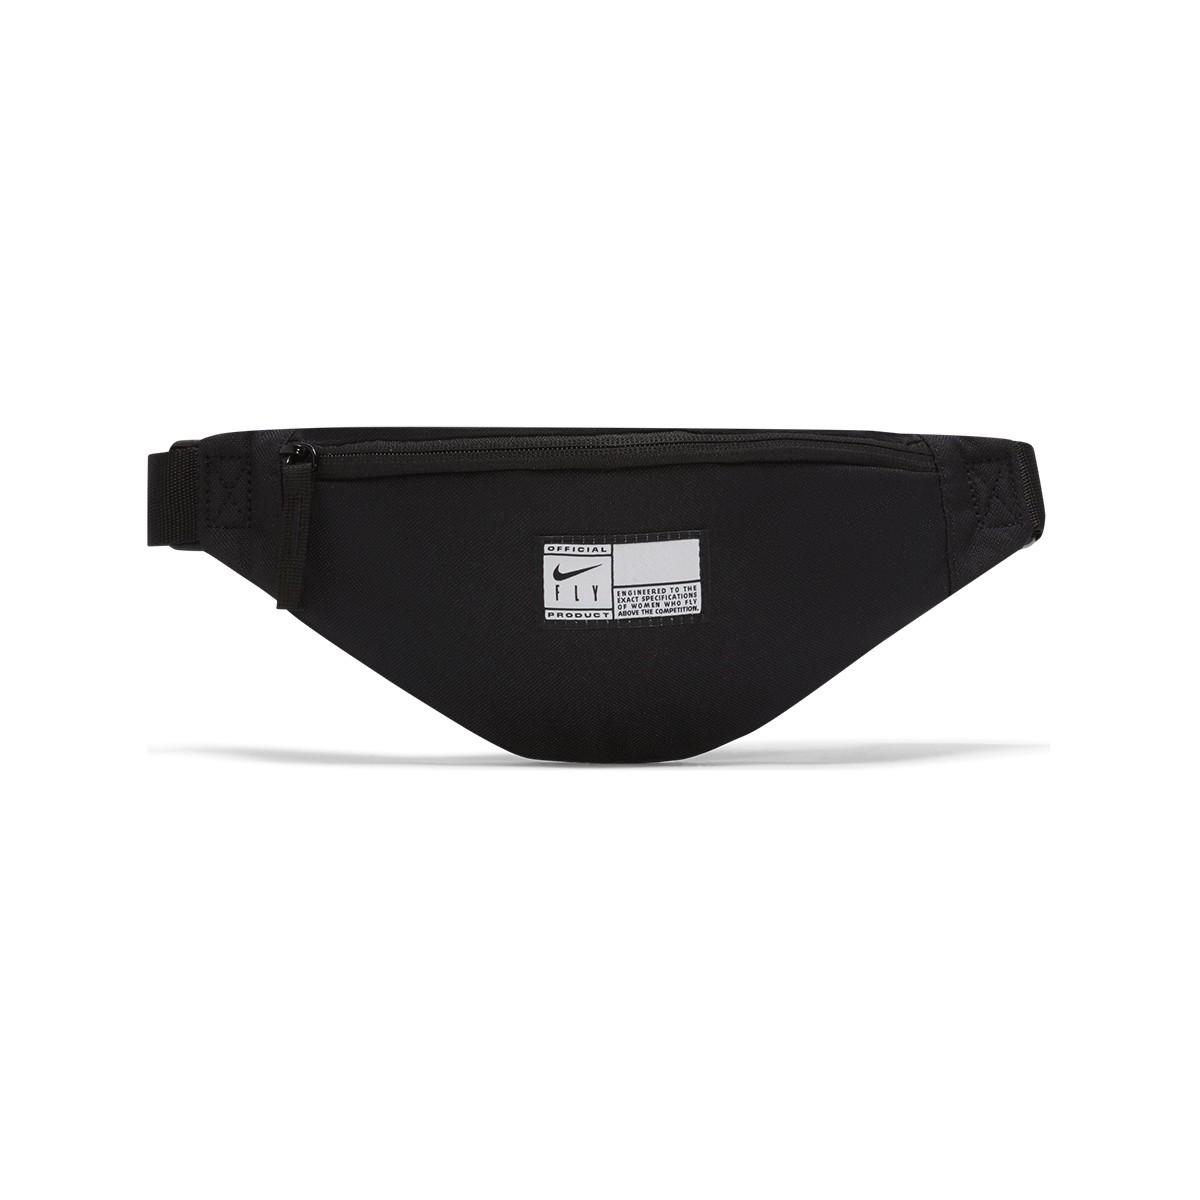 Riñonera Nike Heritage Swoosh Fly 'Black'-DA2275-010